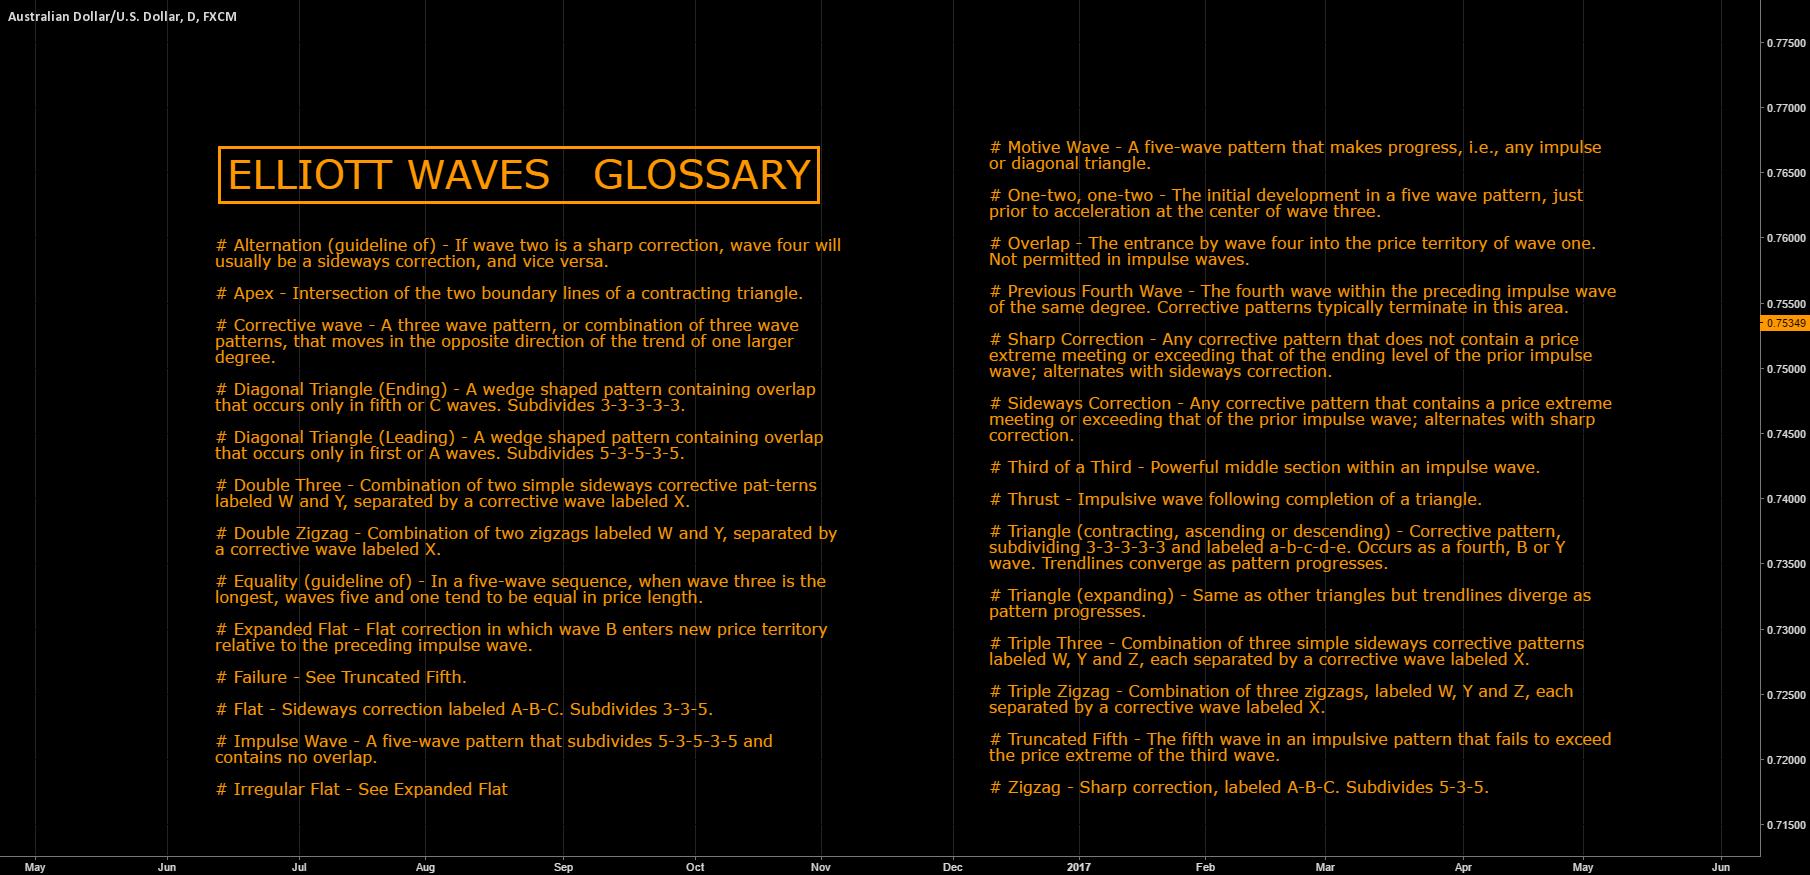 [EW COURSE] GLOSSARY